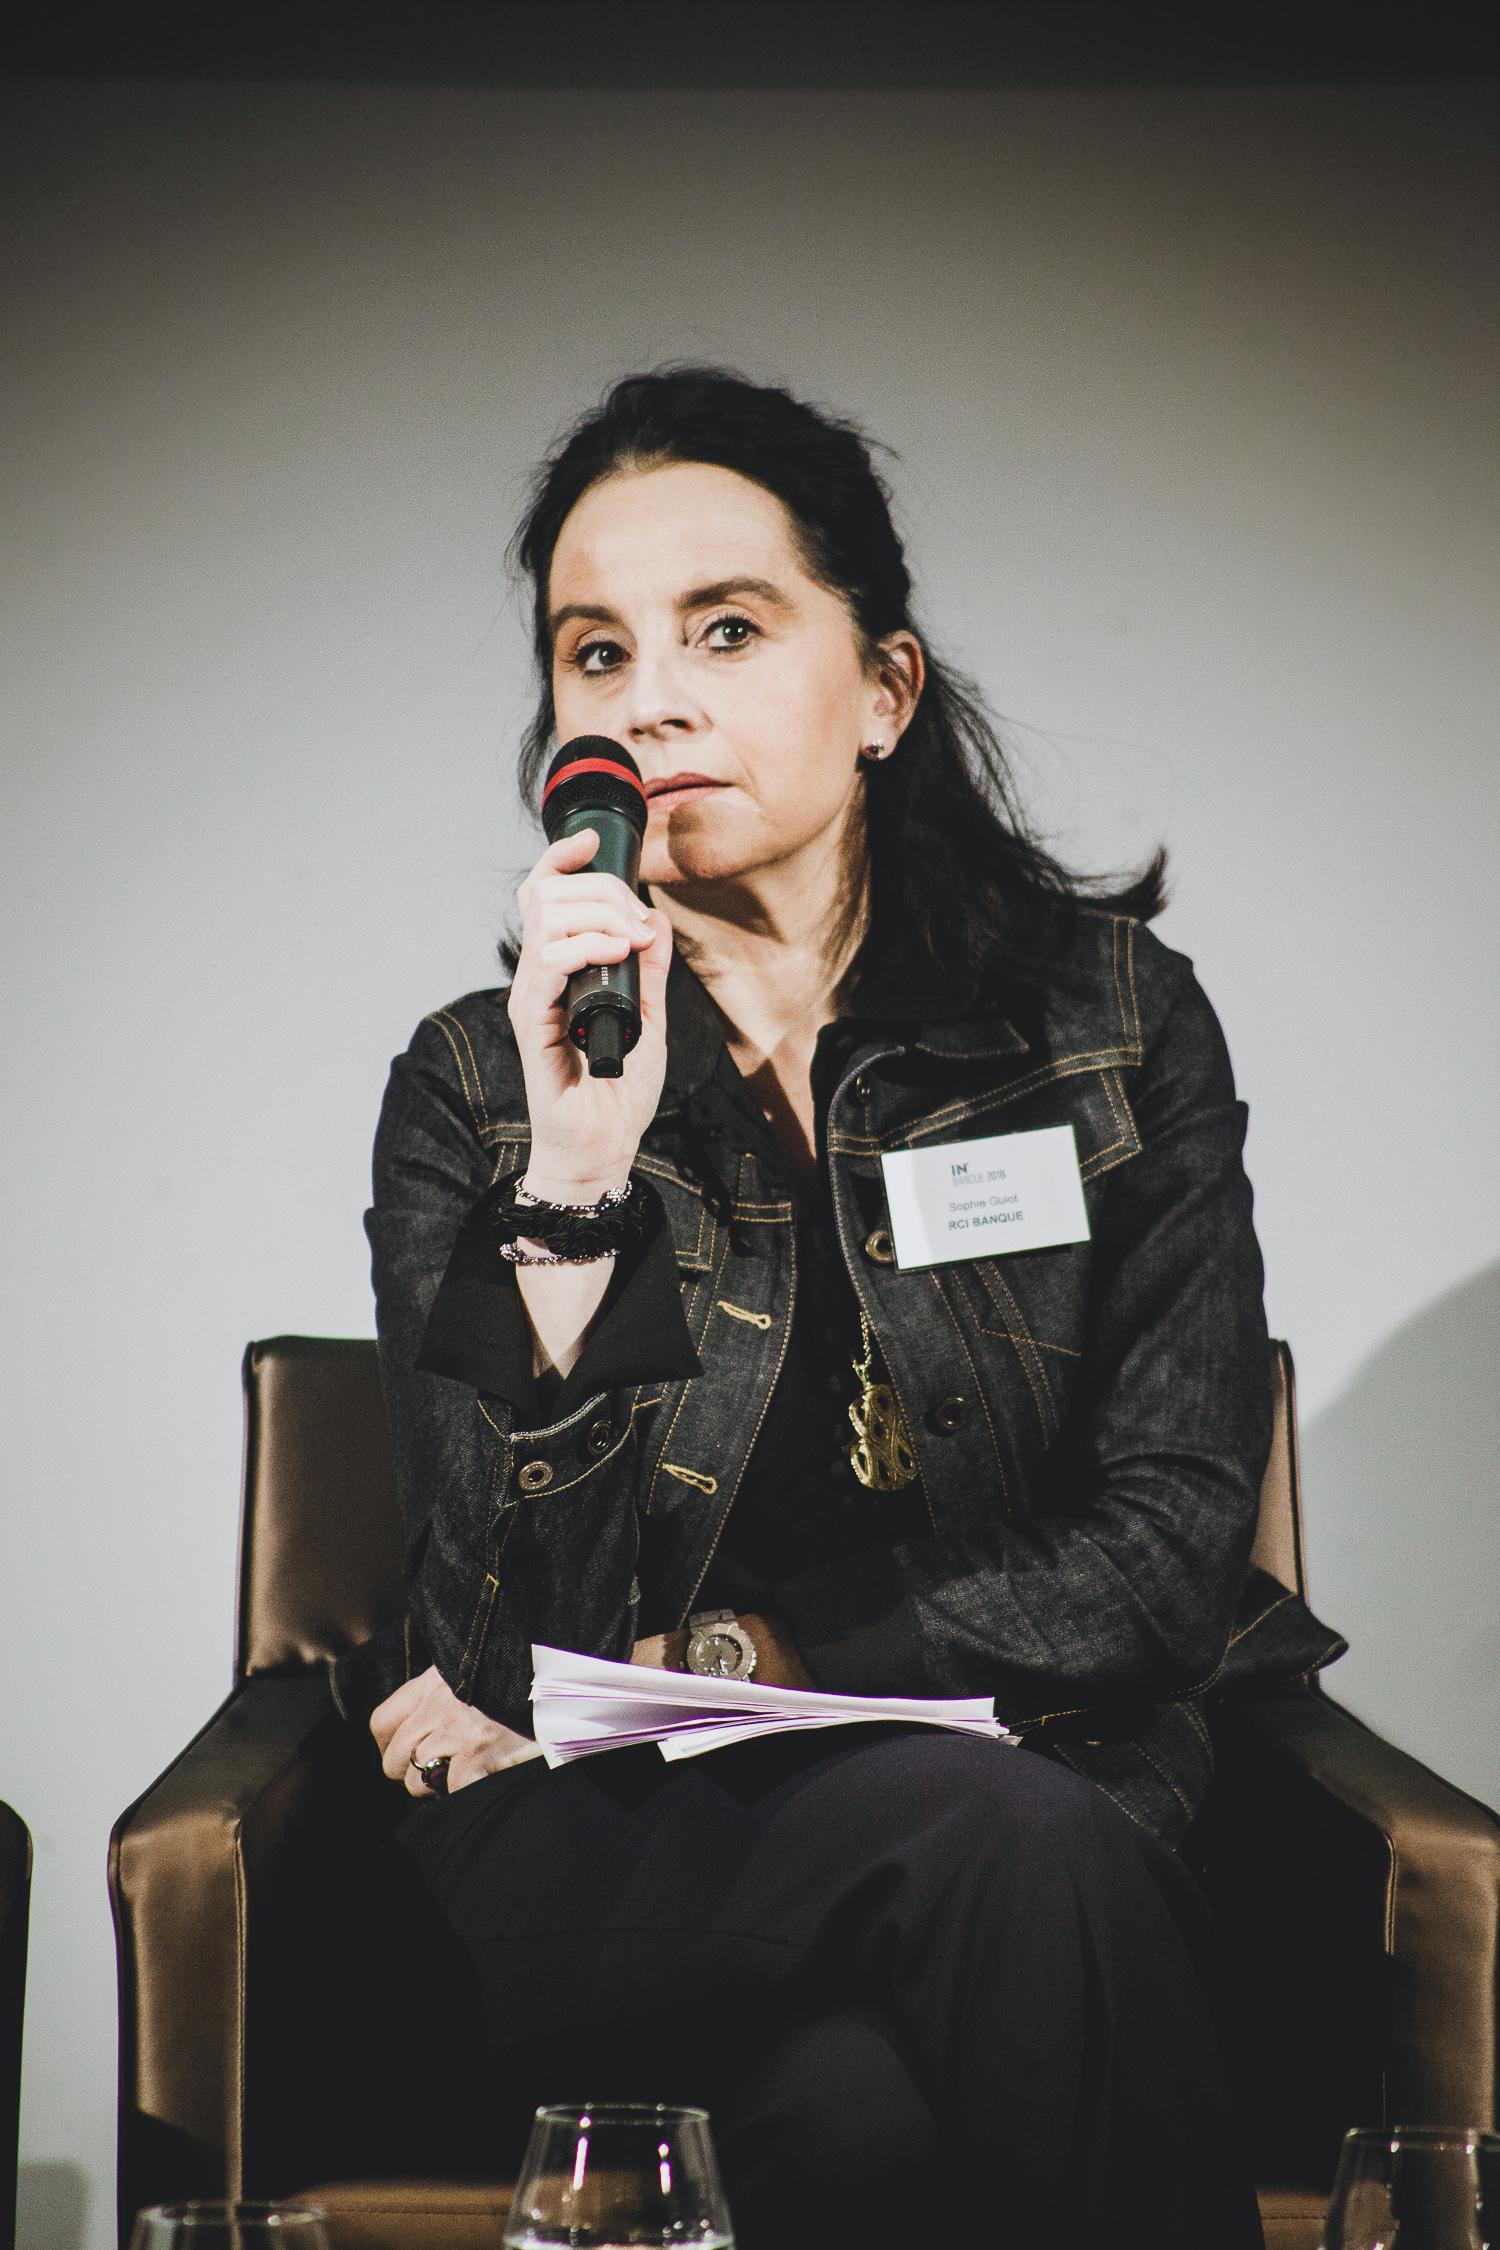 Sophie Guiot (RCI Banque) - IN BANQUE 2016 - Crédit photo : Guillermo Gomez